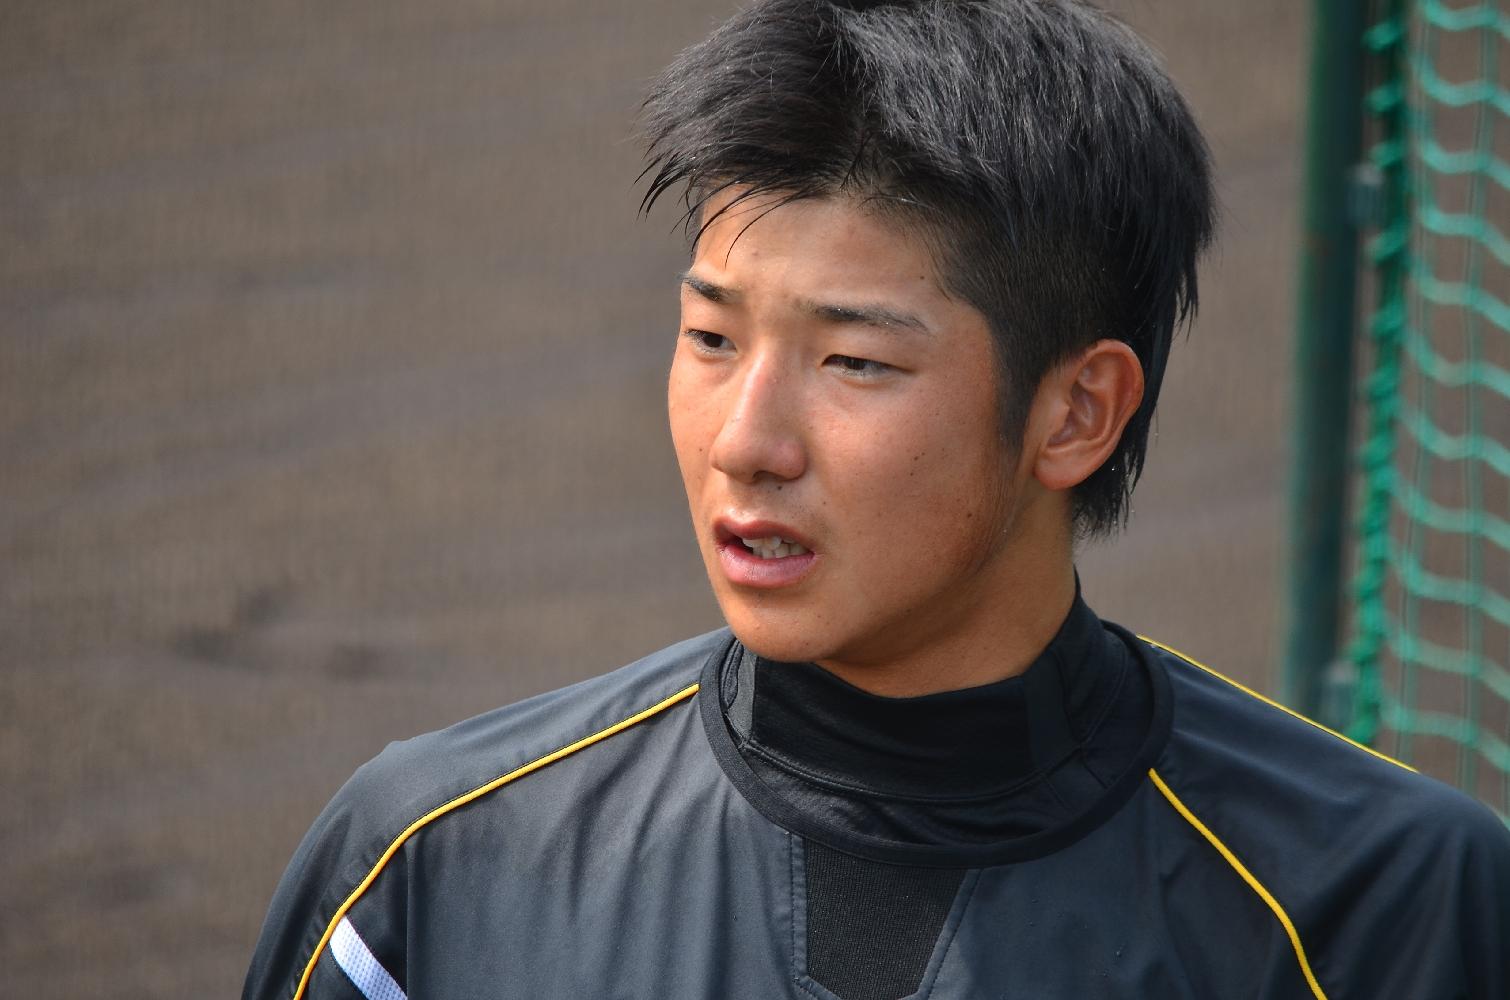 阪神タイガース 横田慎太郎 失言 父 筋肉